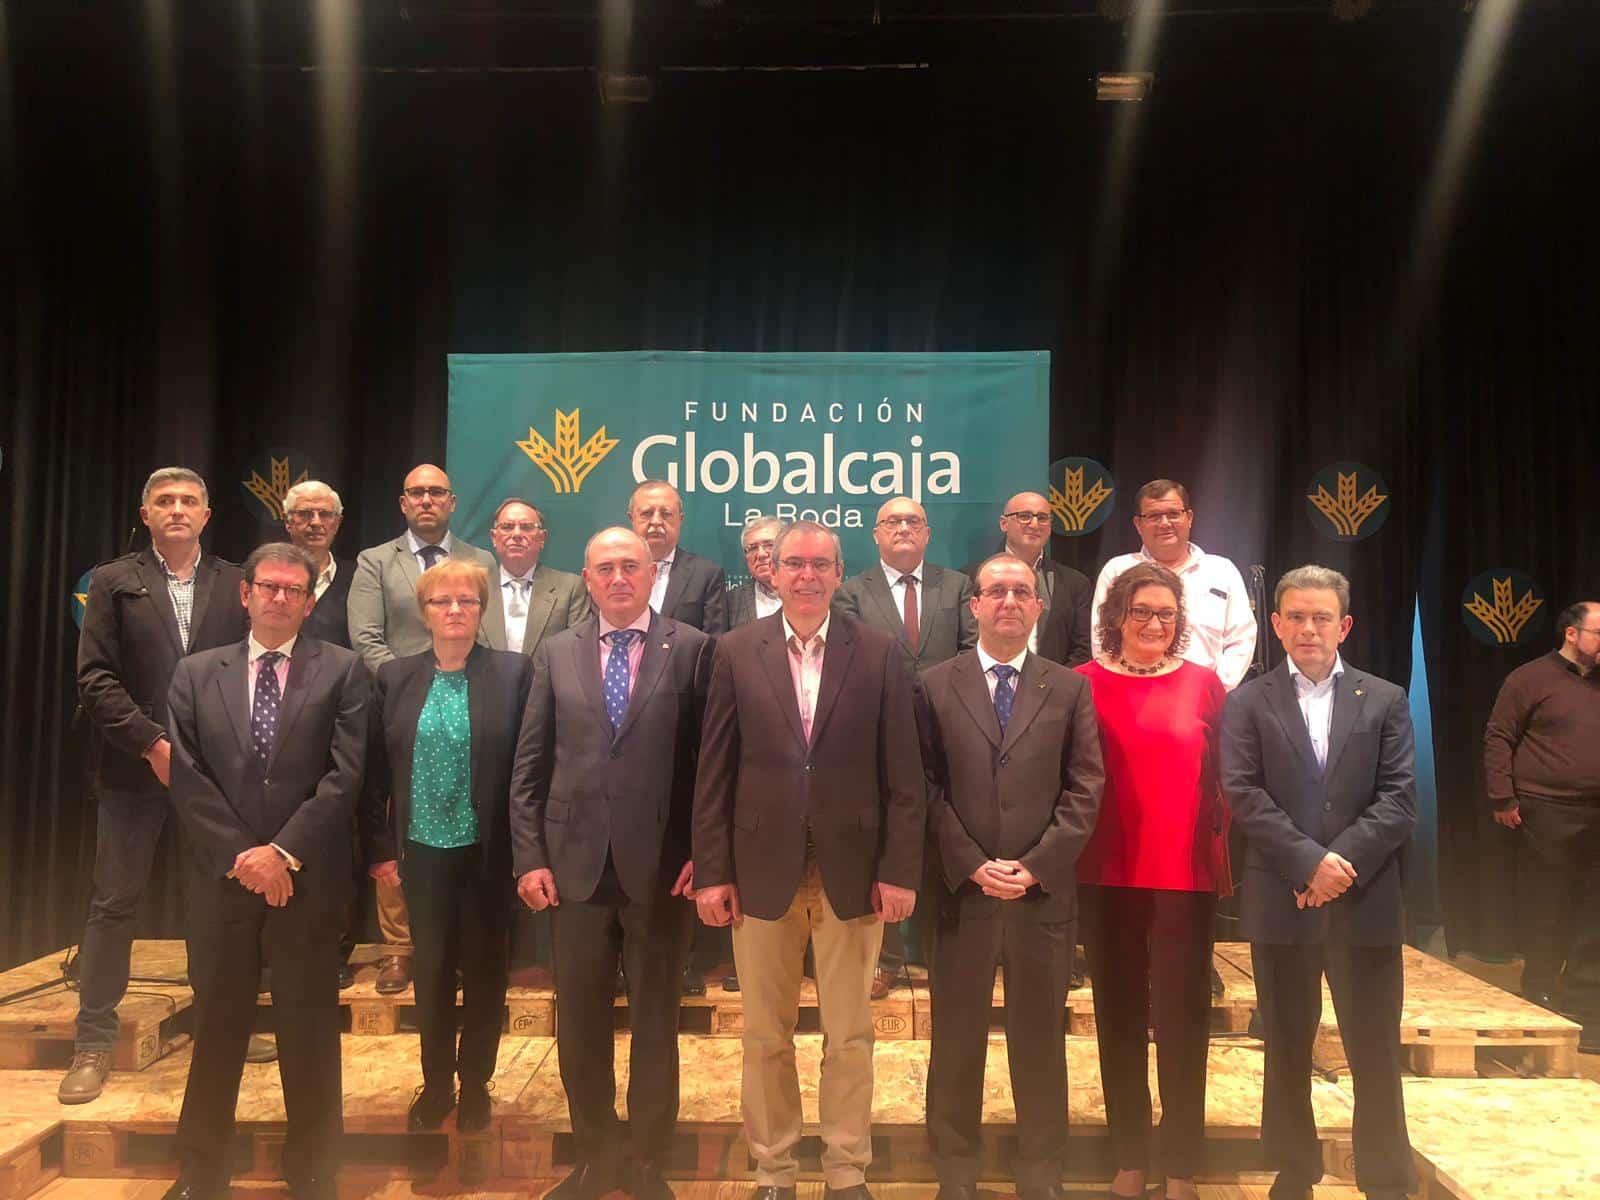 https://blog.globalcaja.es/wp-content/uploads/2019/01/Unknown.jpeg